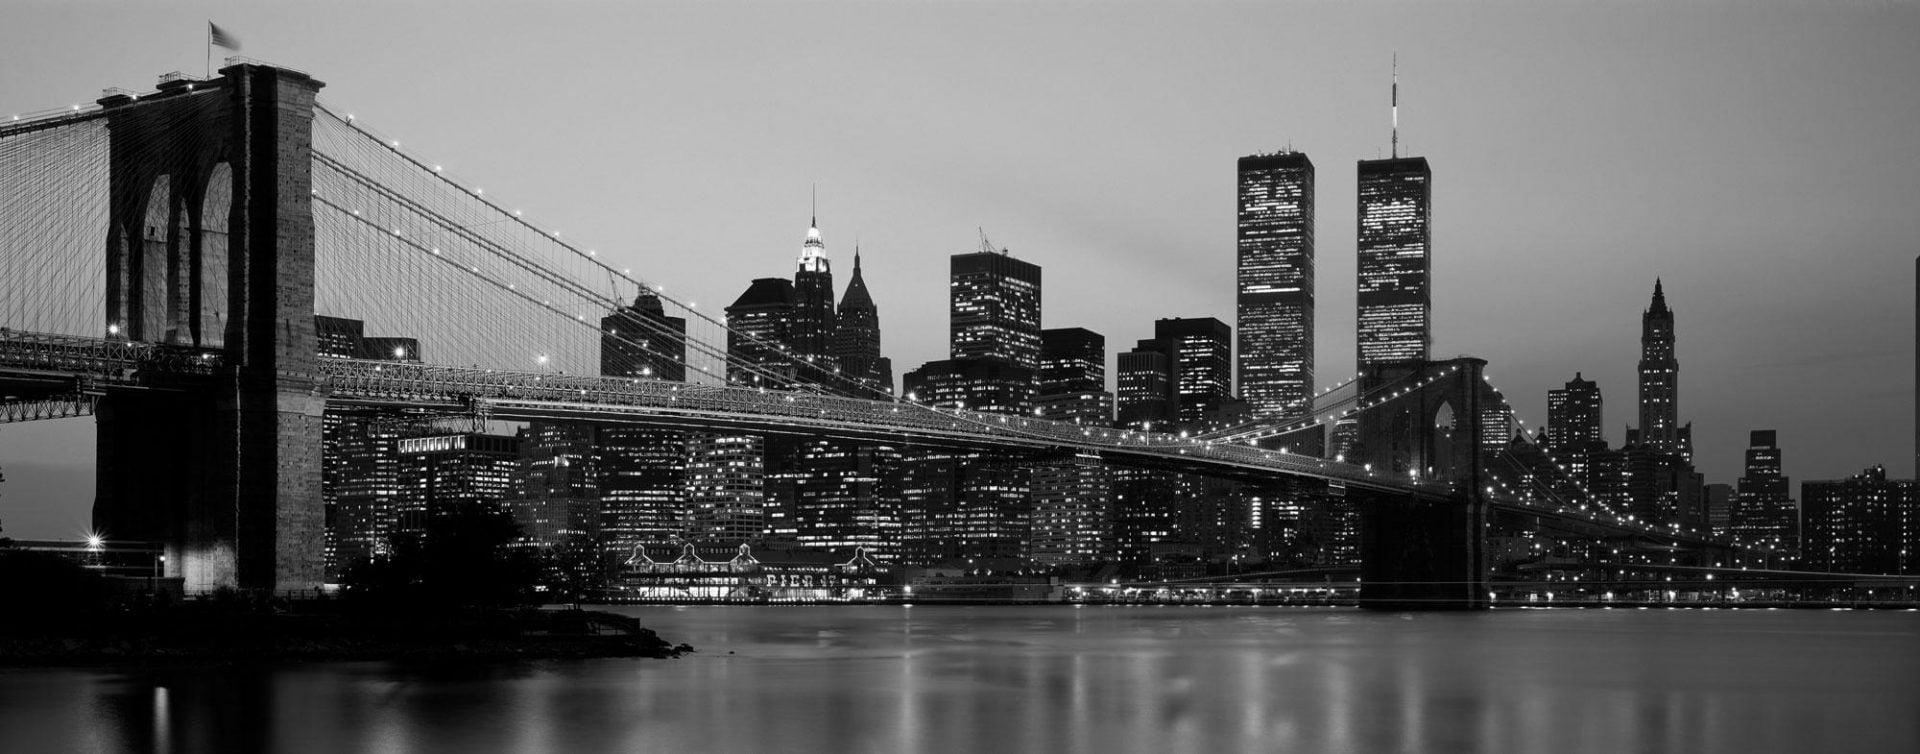 New York Skyline Night Time Photo Mural Wallpaper